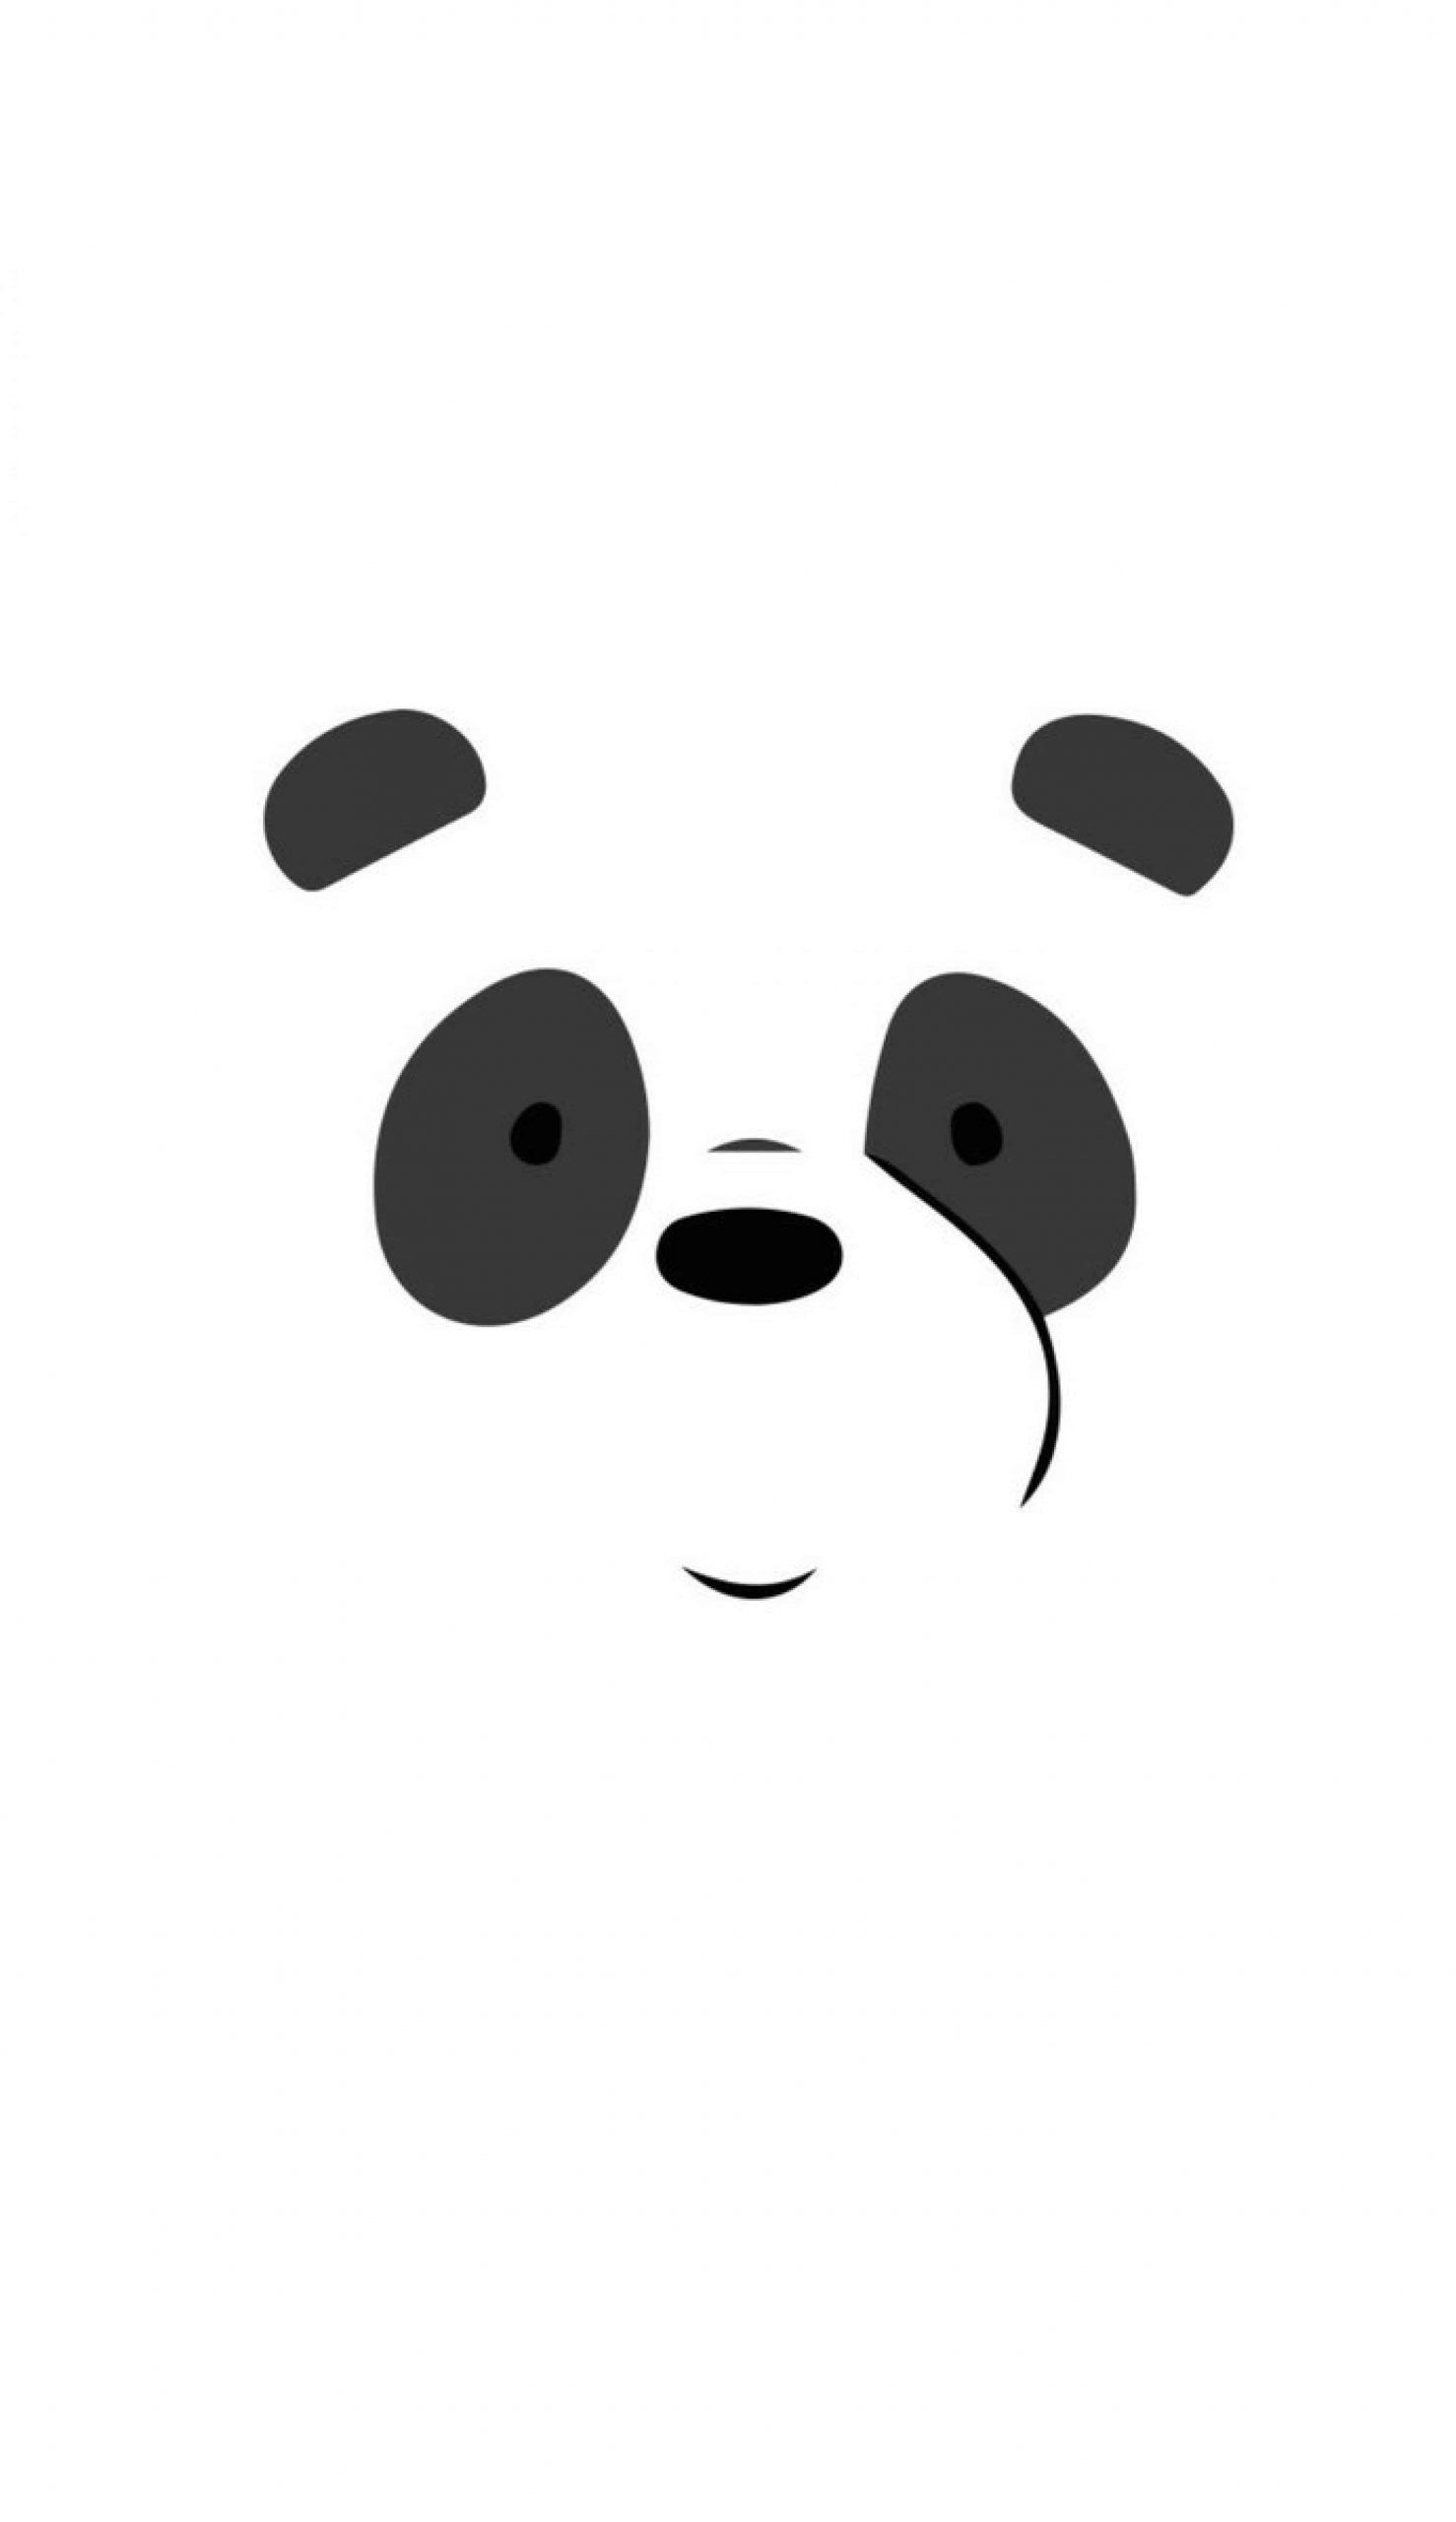 We Bare Bears Wallpapers 4k Hd Windows Desktop Wallpaper Inside Incredible We Bare Bears Wallpaper Black And White Di 2020 Gambar Hewan Gambar Hewan Lucu Hewan Lucu